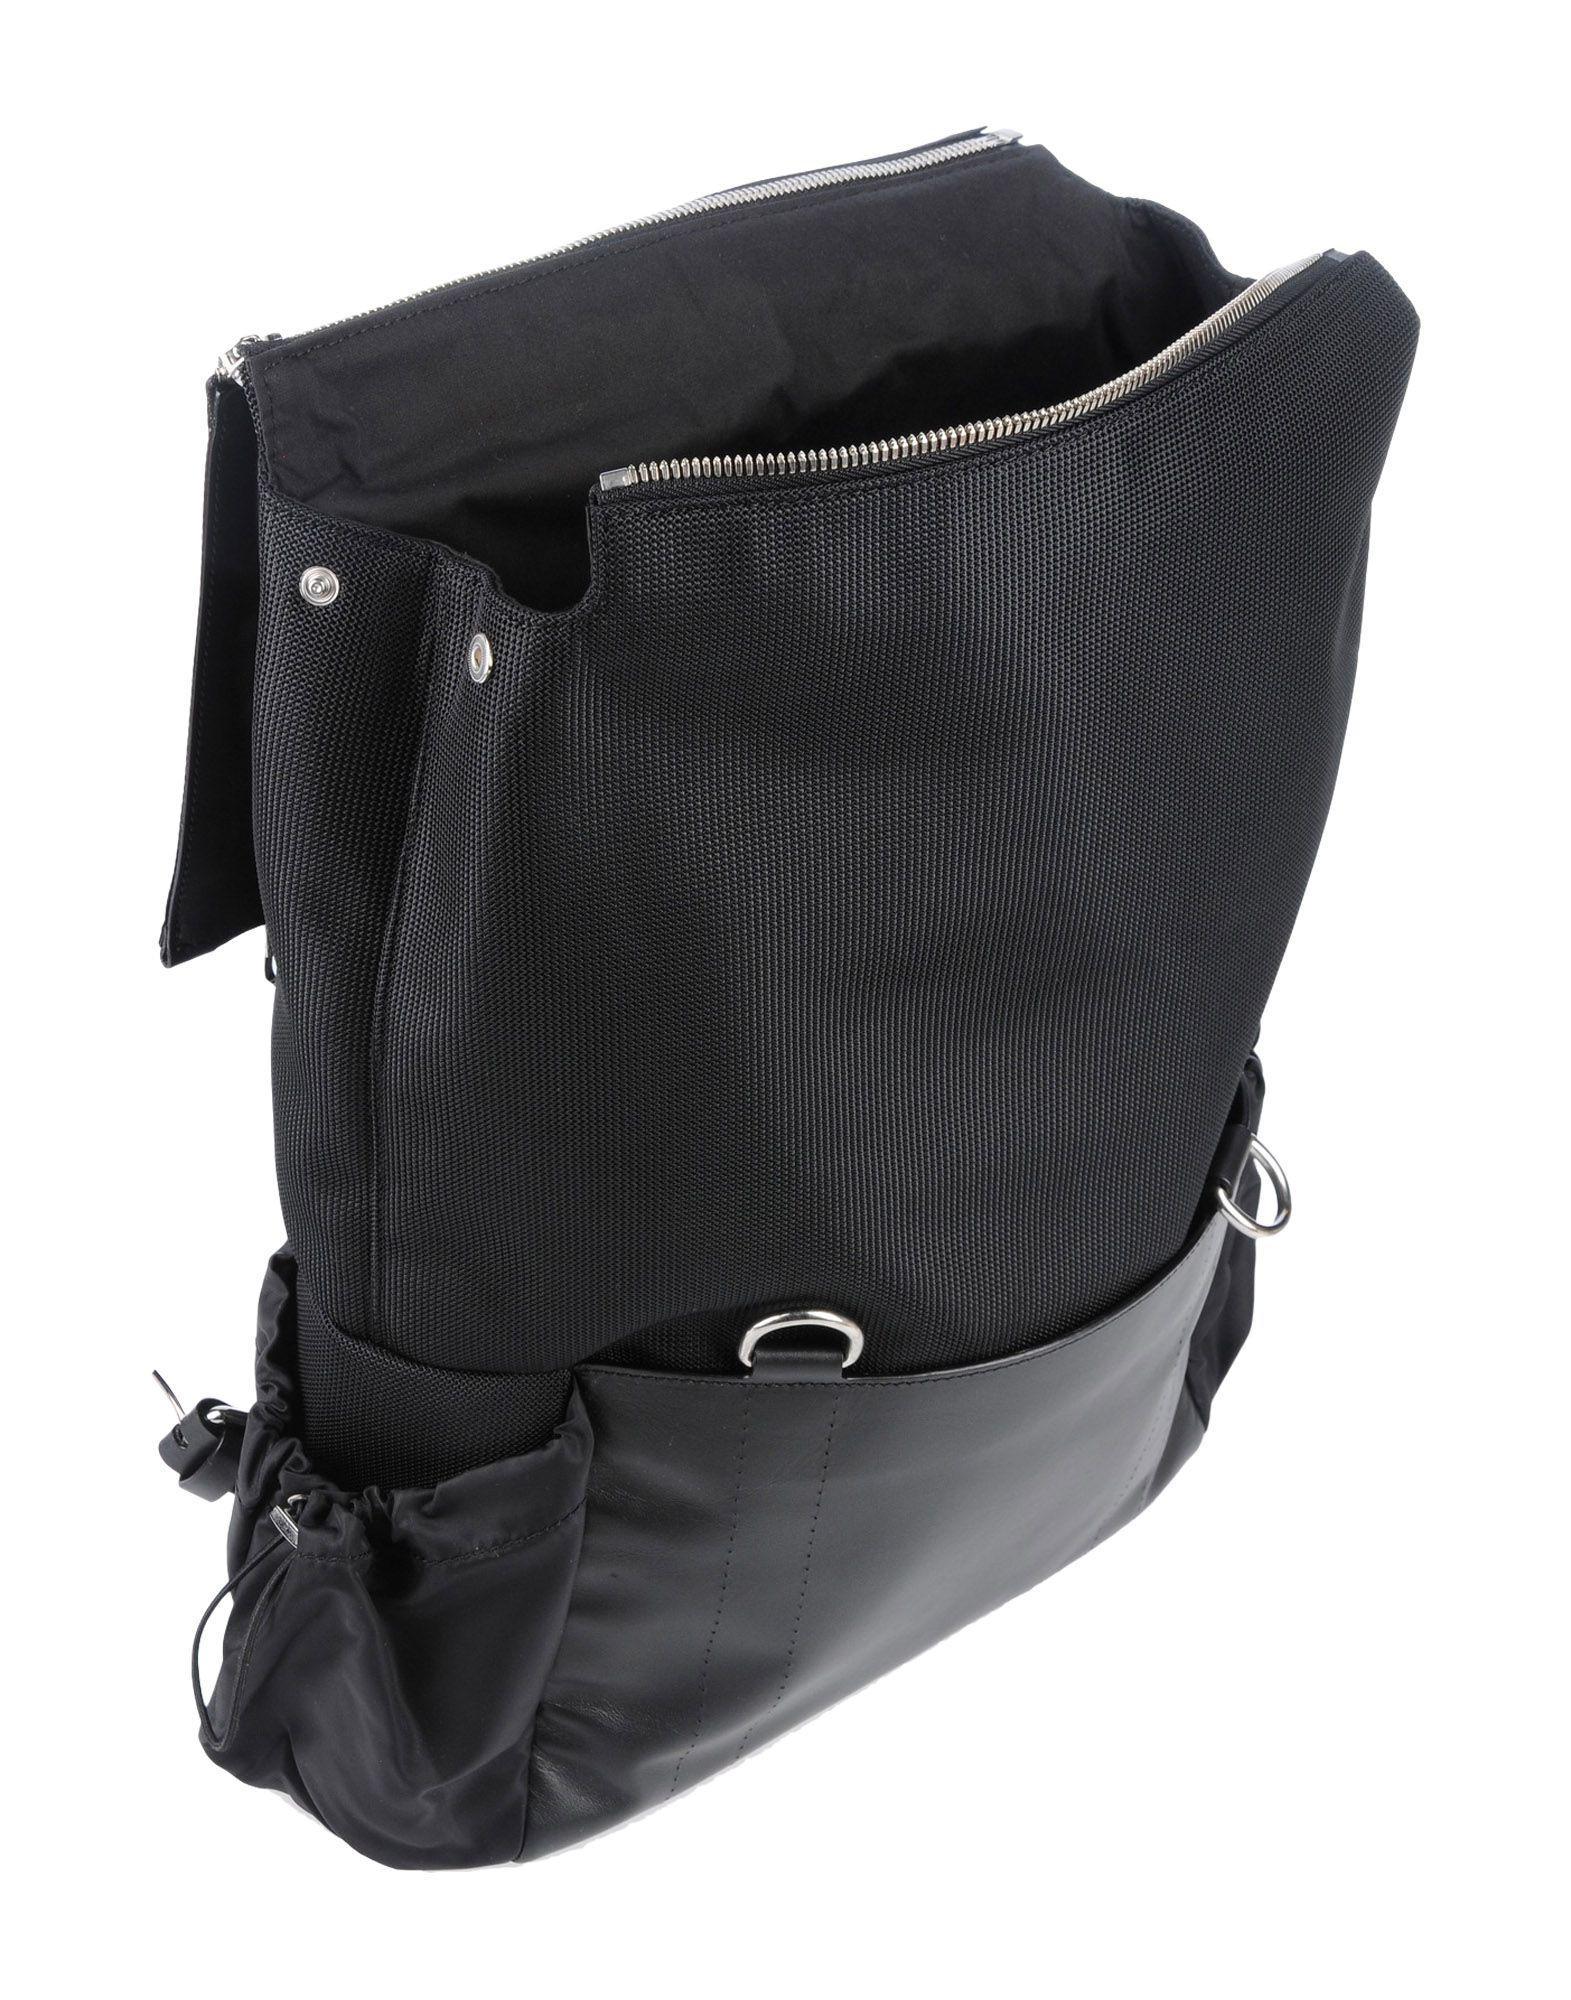 Men Lyst Backpacks For In amp; Bum Maison Bags Black Margiela FwpvqzwnS